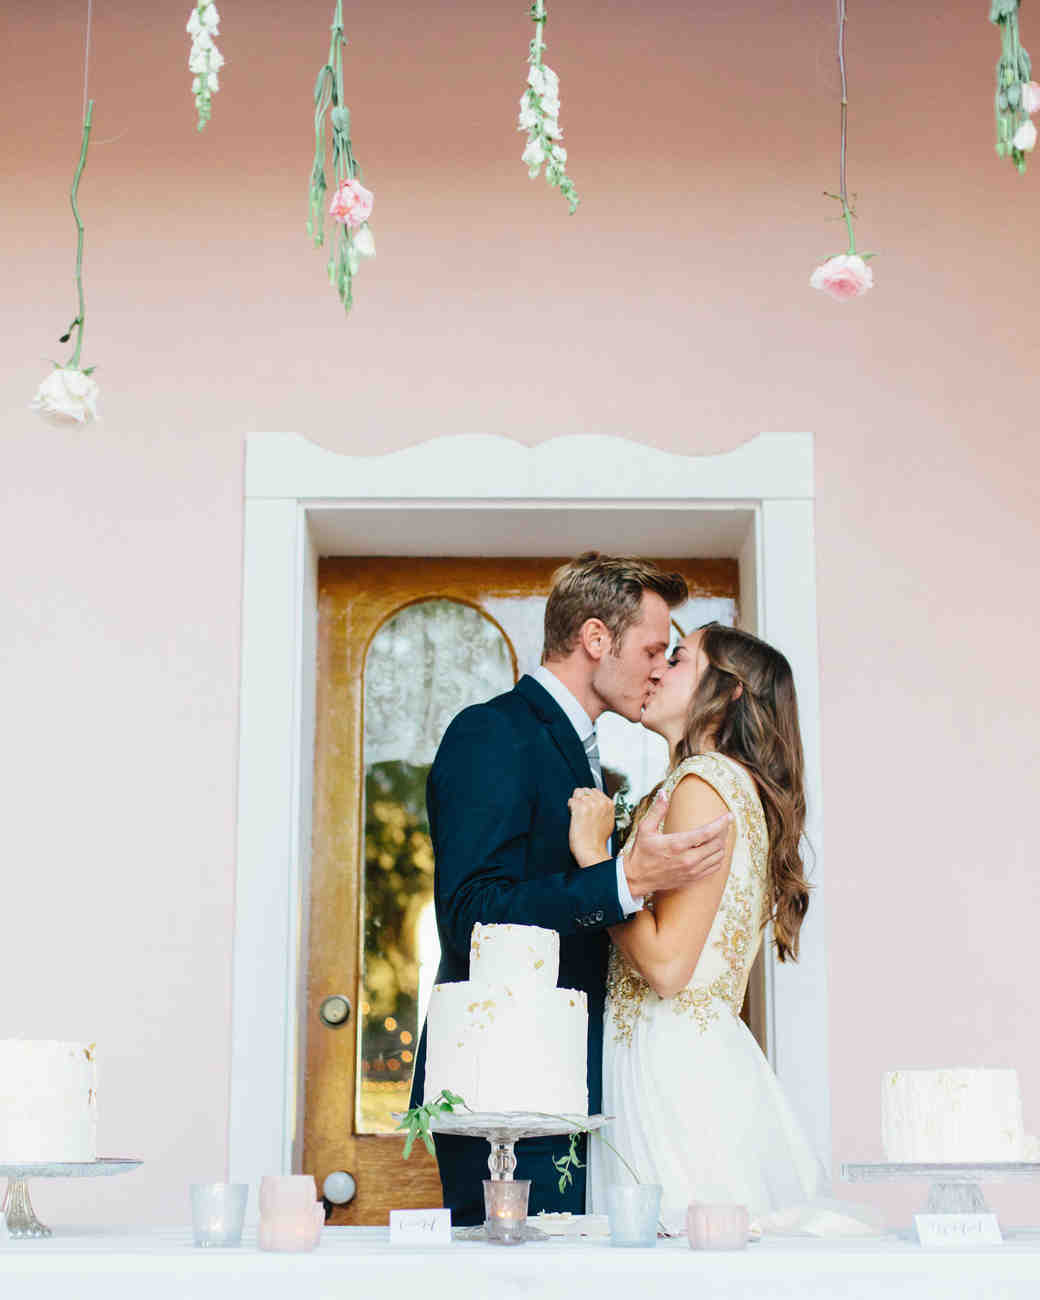 mackenzie-boman-wedding-cakecutting-216-s112693-0316.jpg